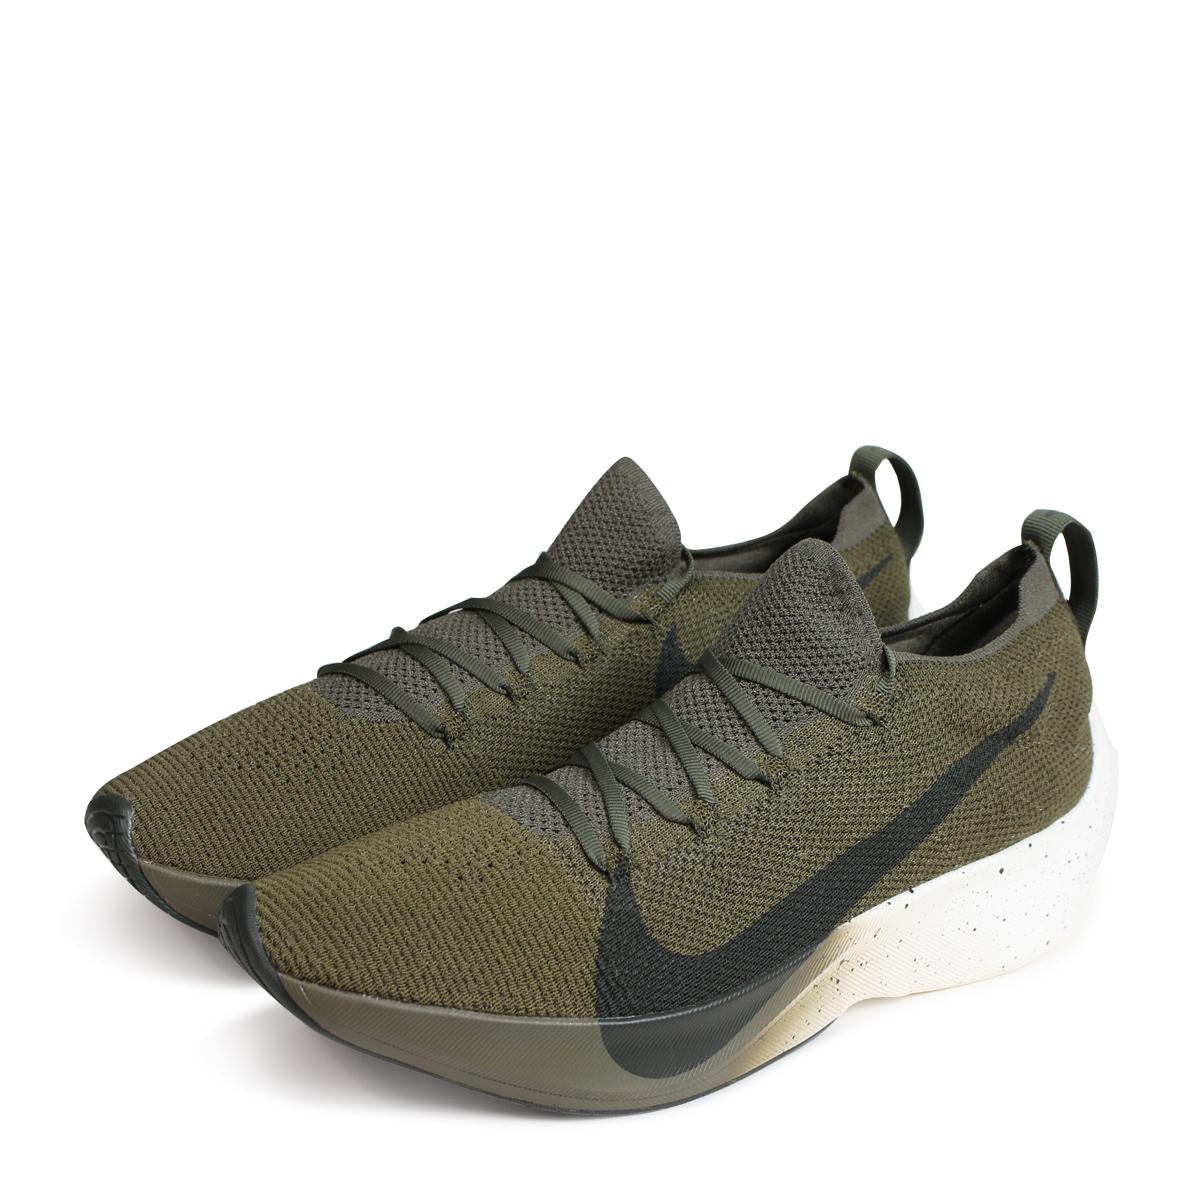 939630946dbcb ALLSPORTS  NIKE VAPOR STREET FLYKNIT Nike vapor street sneakers men ...